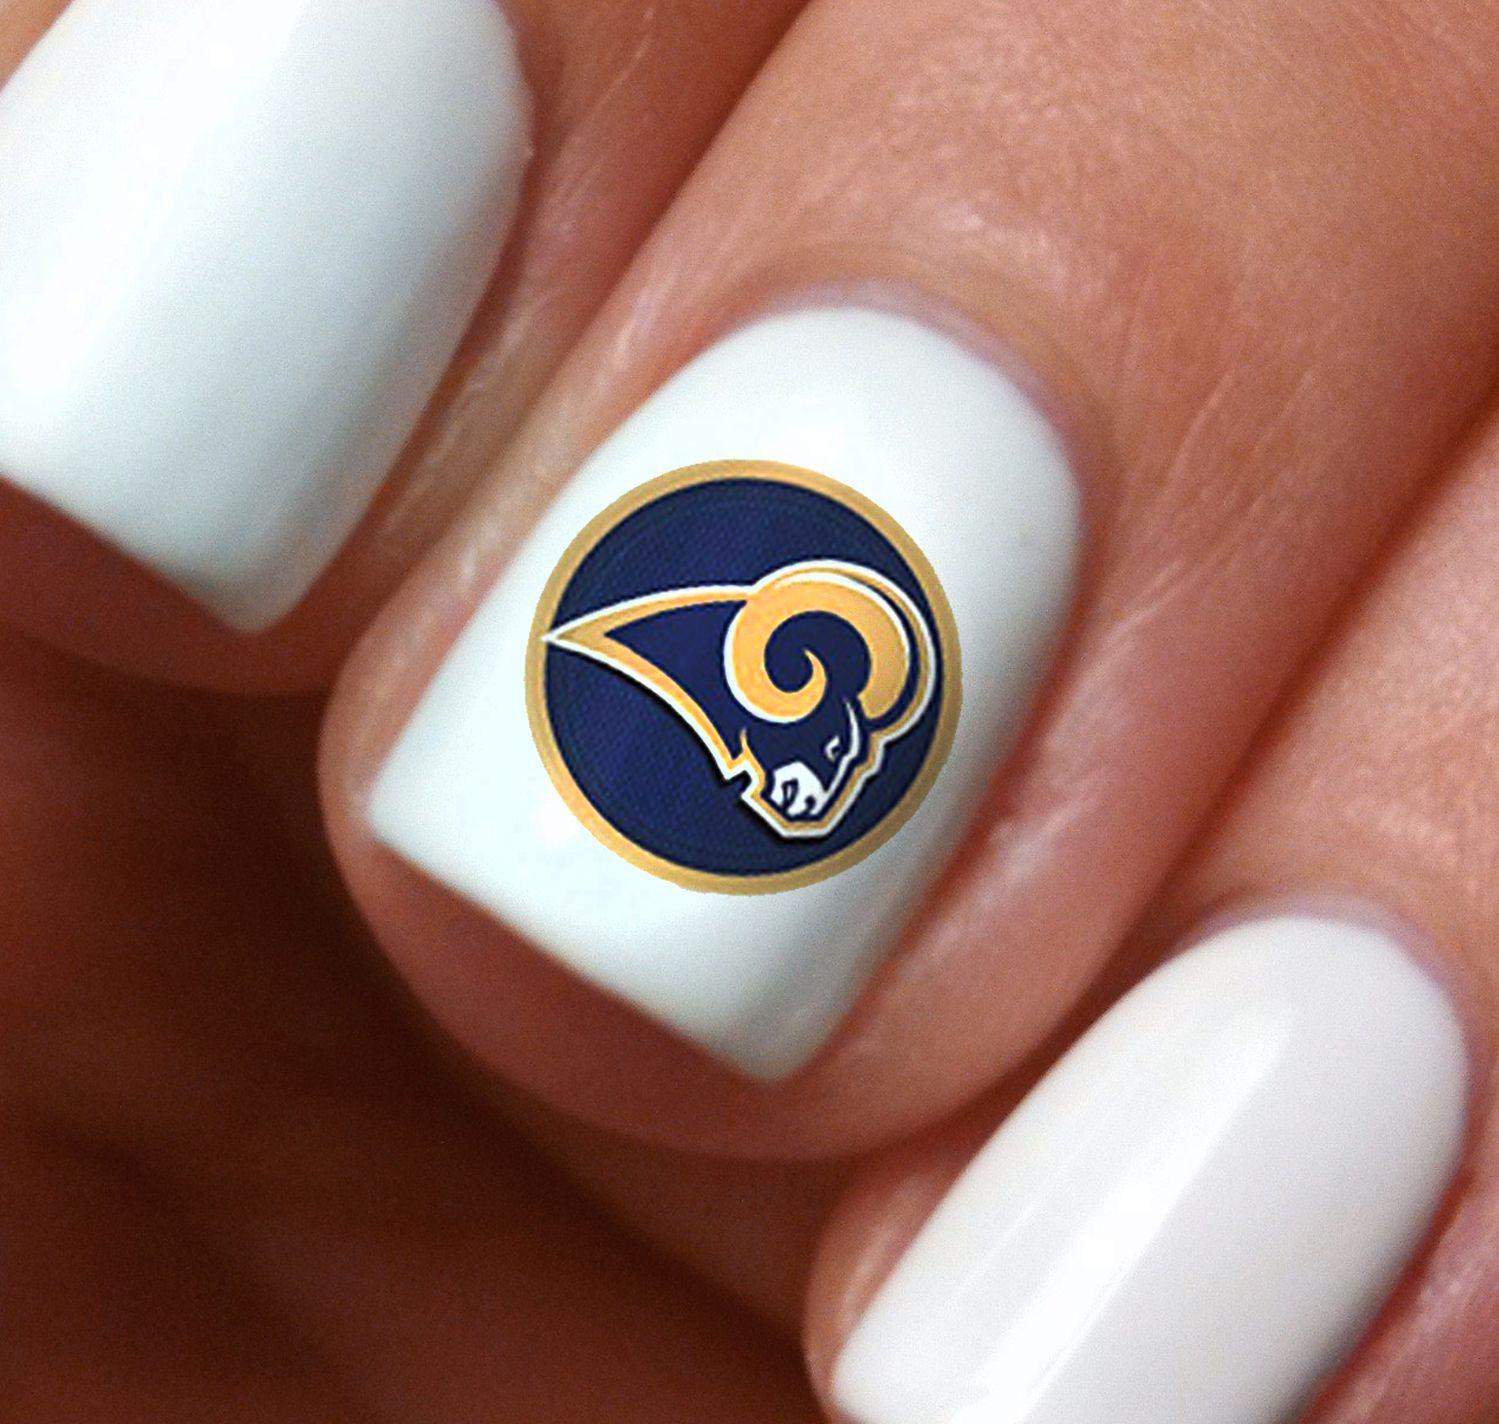 Los Angeles Rams Football Nail Art Decals Salon Quality Football Nail Art Football Nails Nail Art